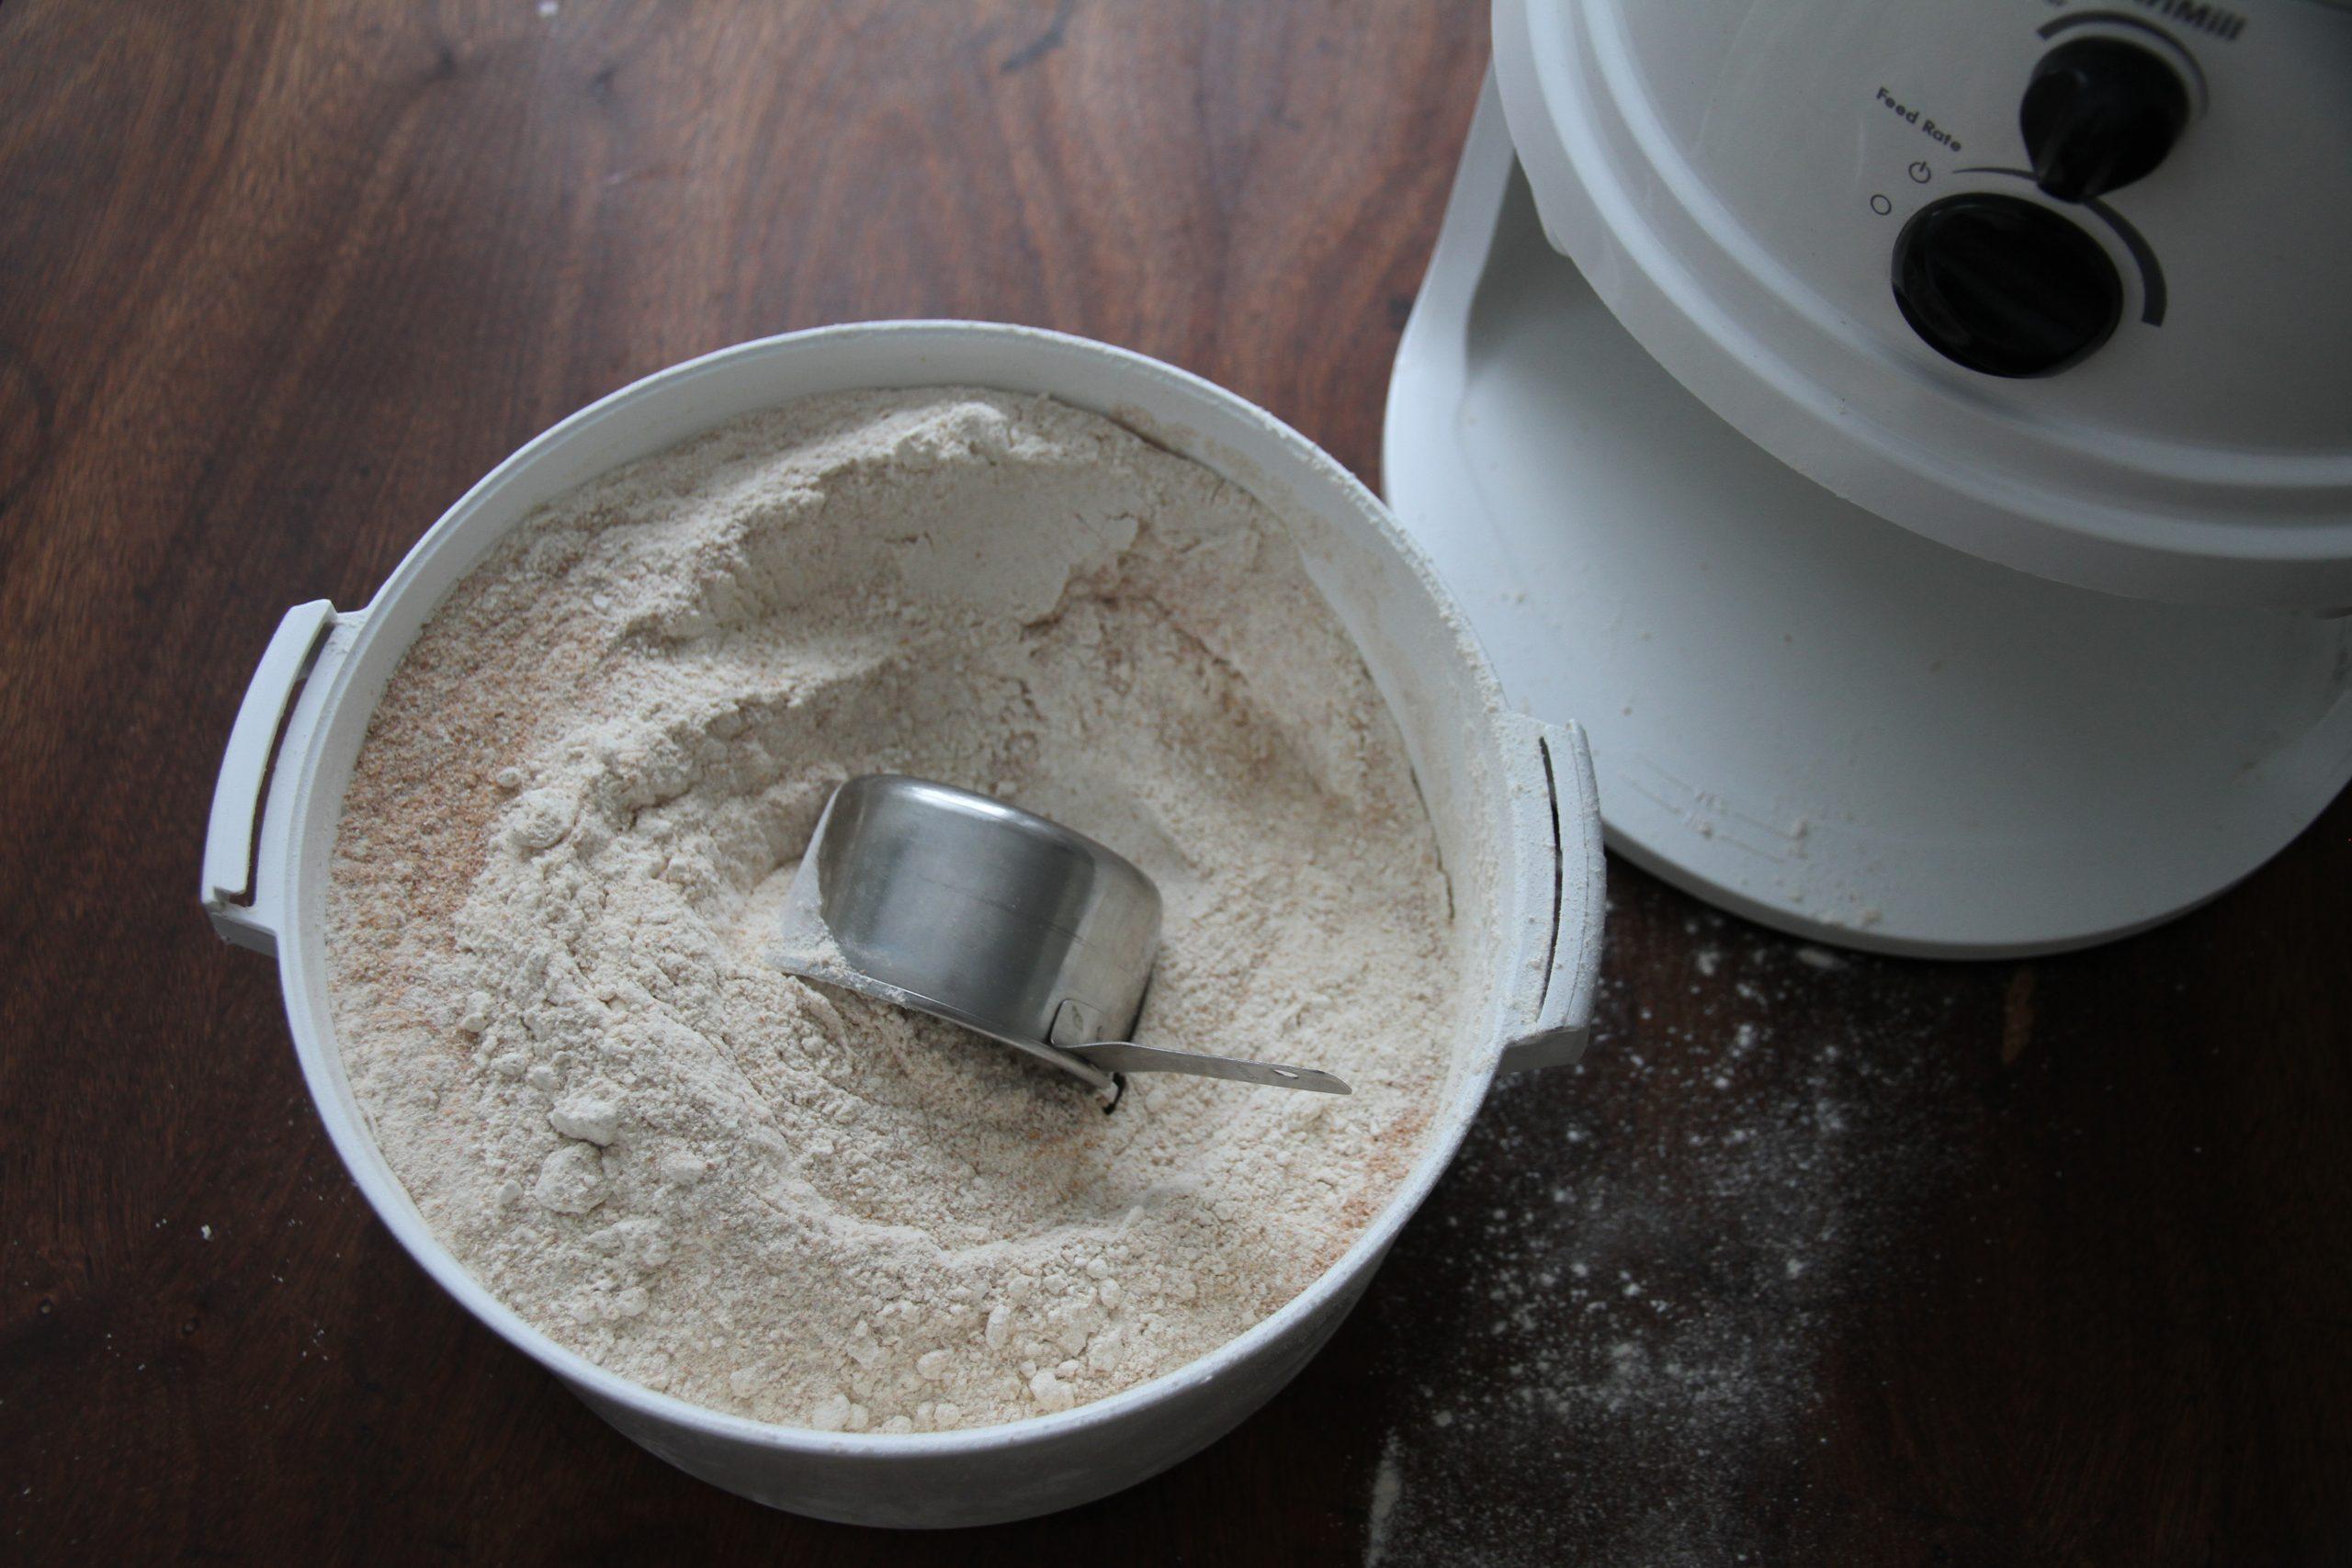 Fresh milled, whole wheat flour